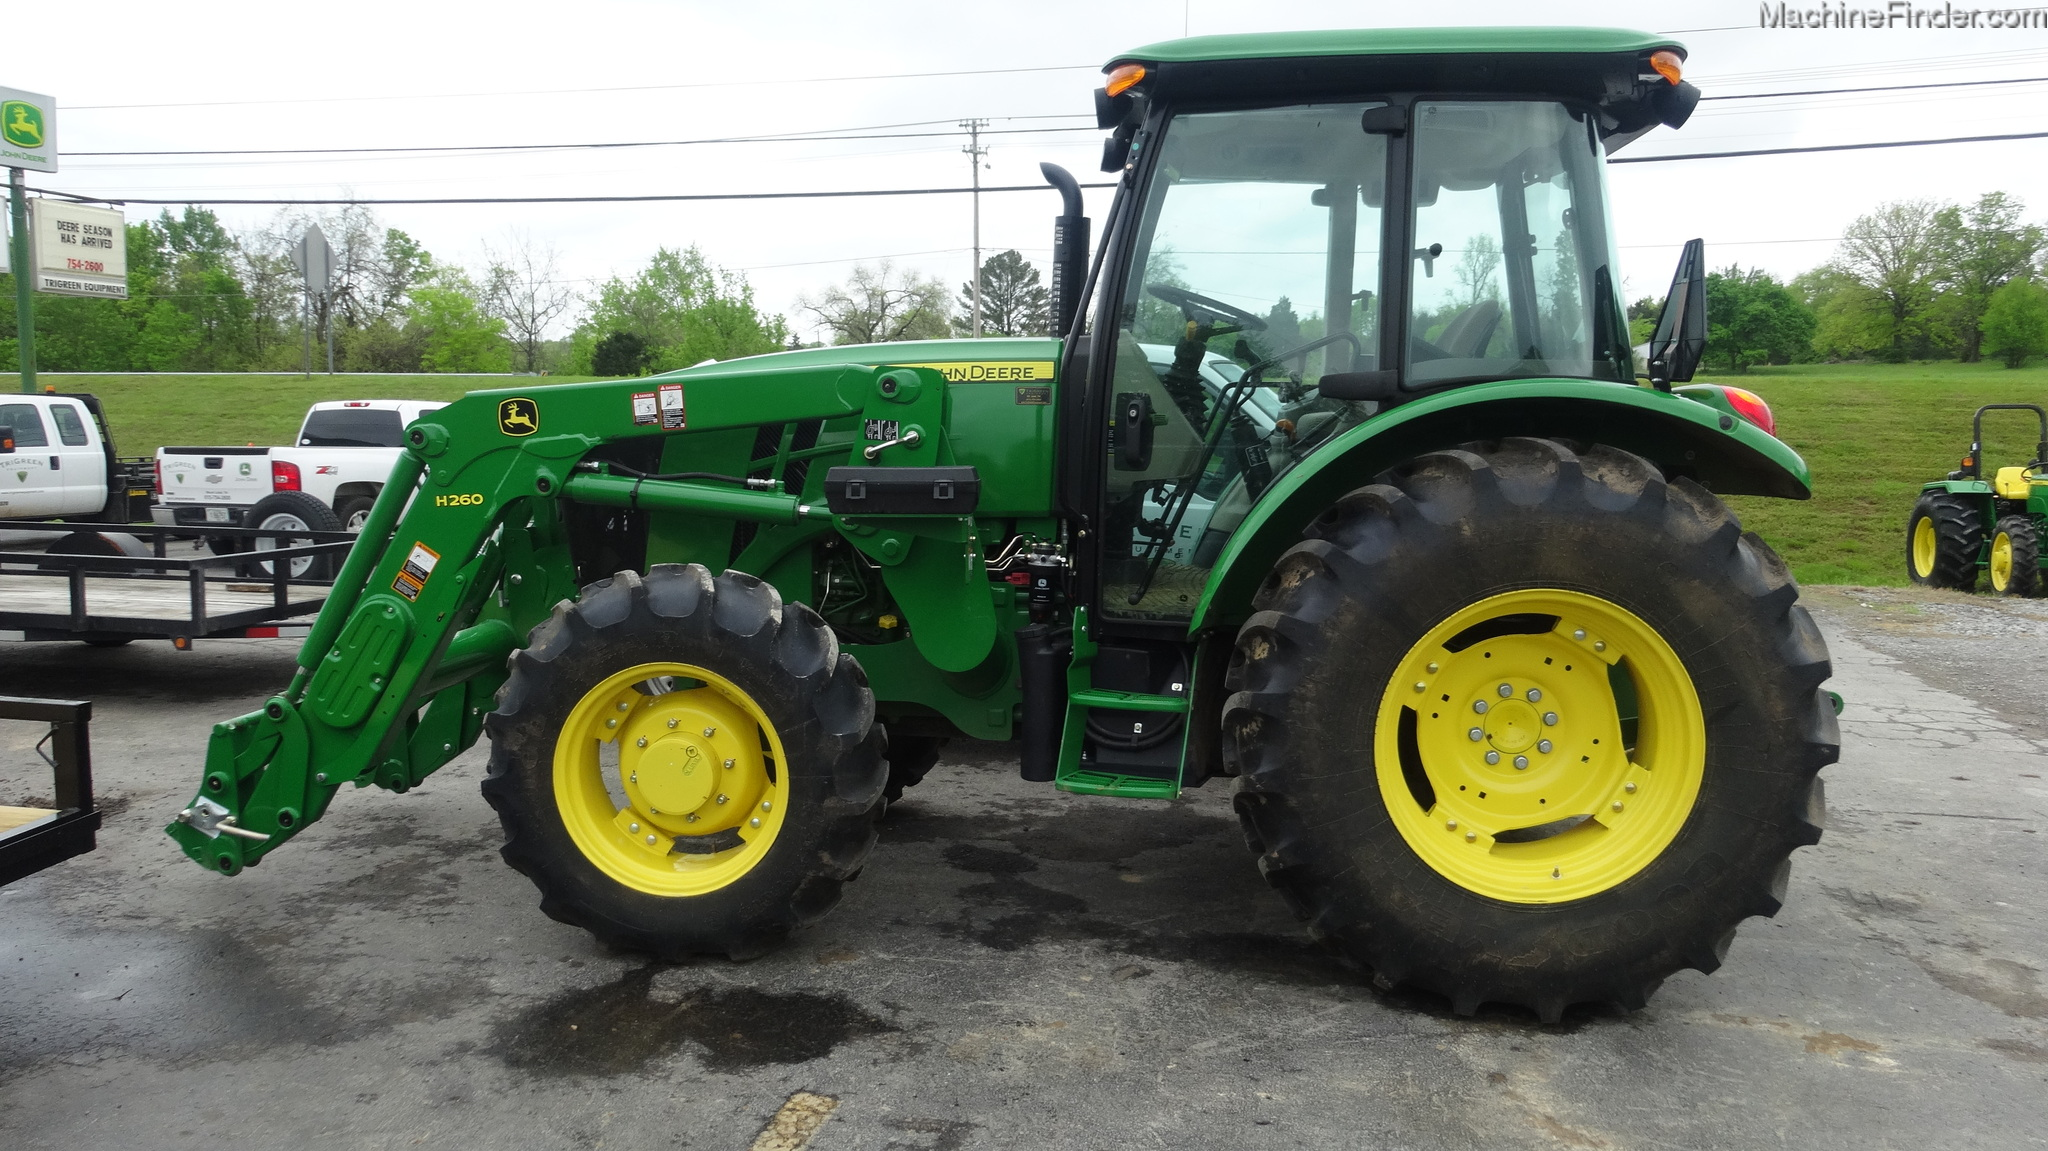 2014 John Deere 5100E Tractors - Utility (40-100hp) - John Deere ...